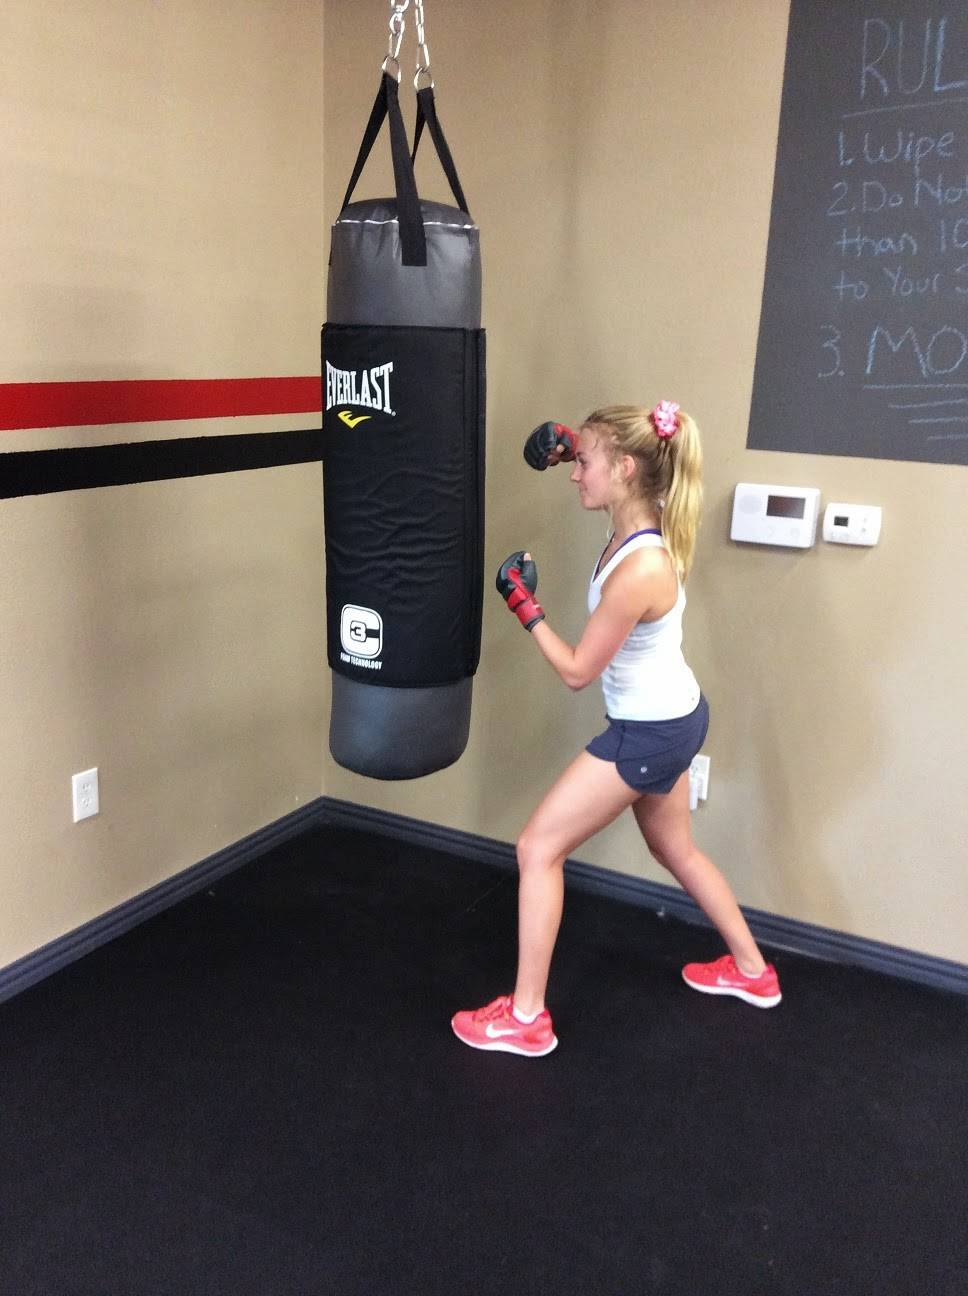 Jonathans Private Training Studio, LLC - health  | Photo 2 of 10 | Address: 939 W Jefferson Blvd #105, Dallas, TX 75208, USA | Phone: (214) 779-7128